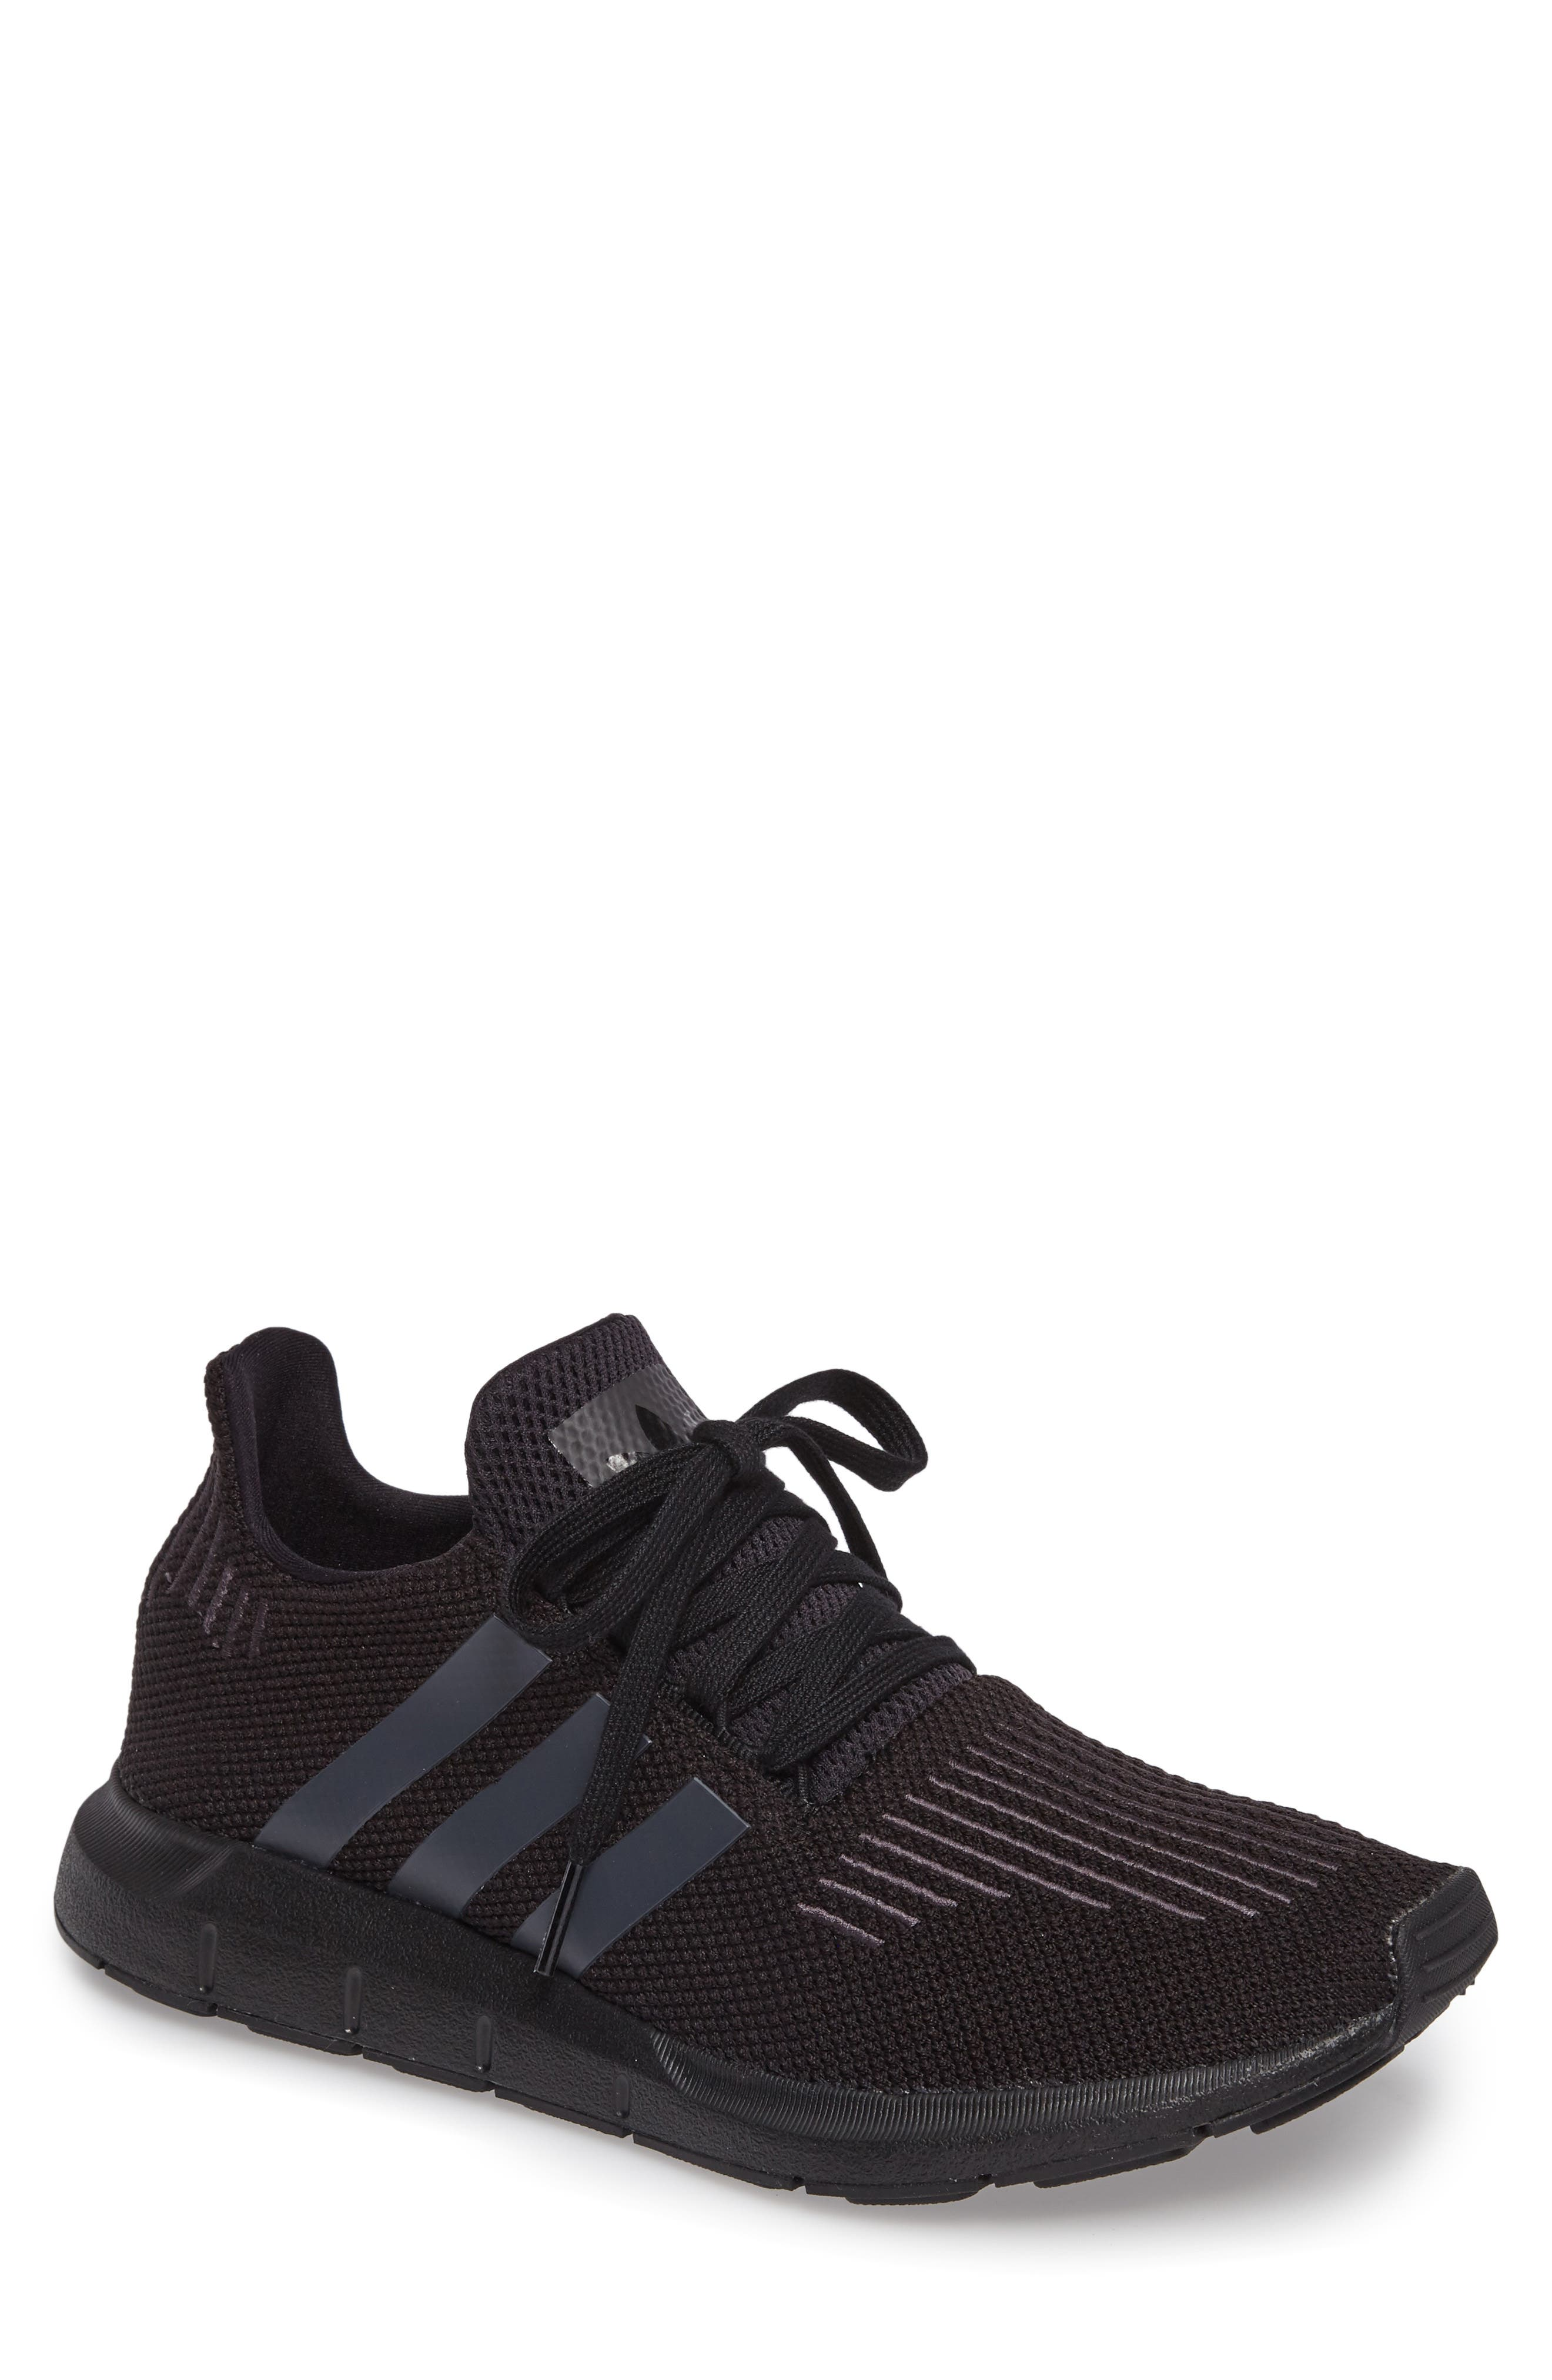 Alternate Image 1 Selected - adidas Swift Run Running Shoe (Men)